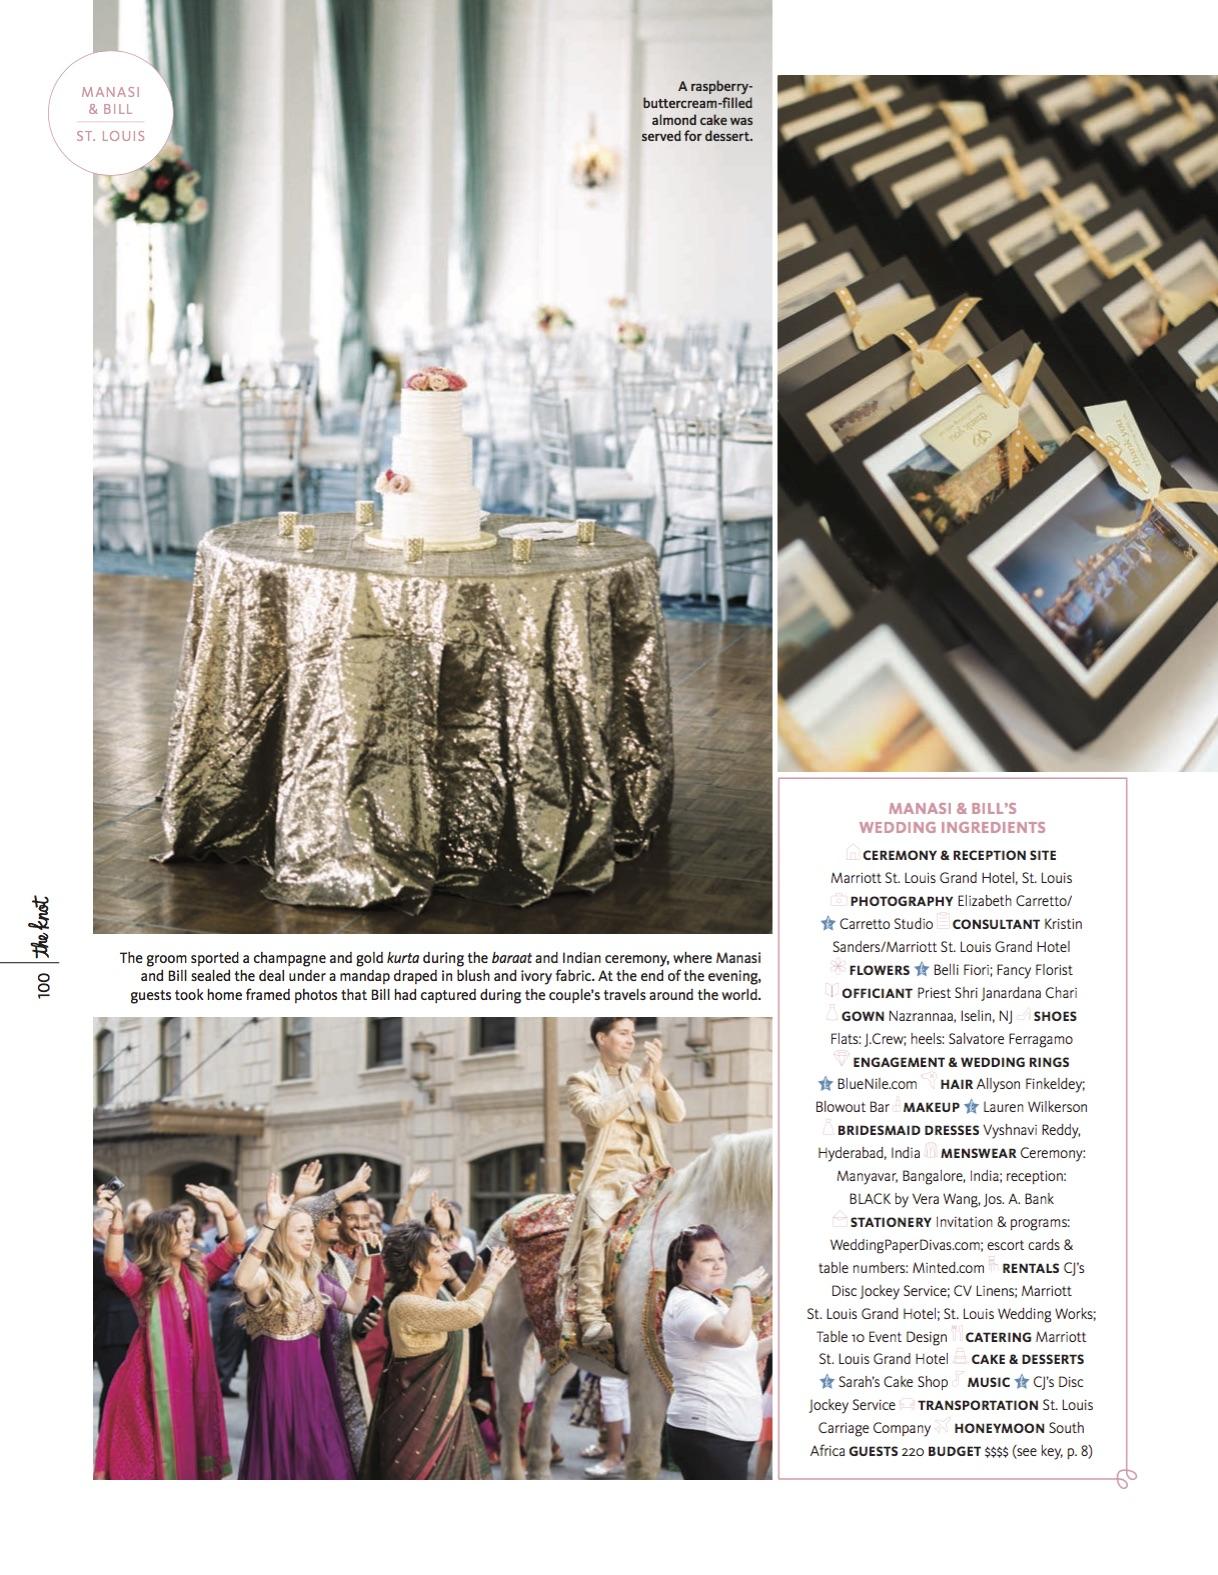 st-louis-indian-wedding-photography-carretto-studio.jpg